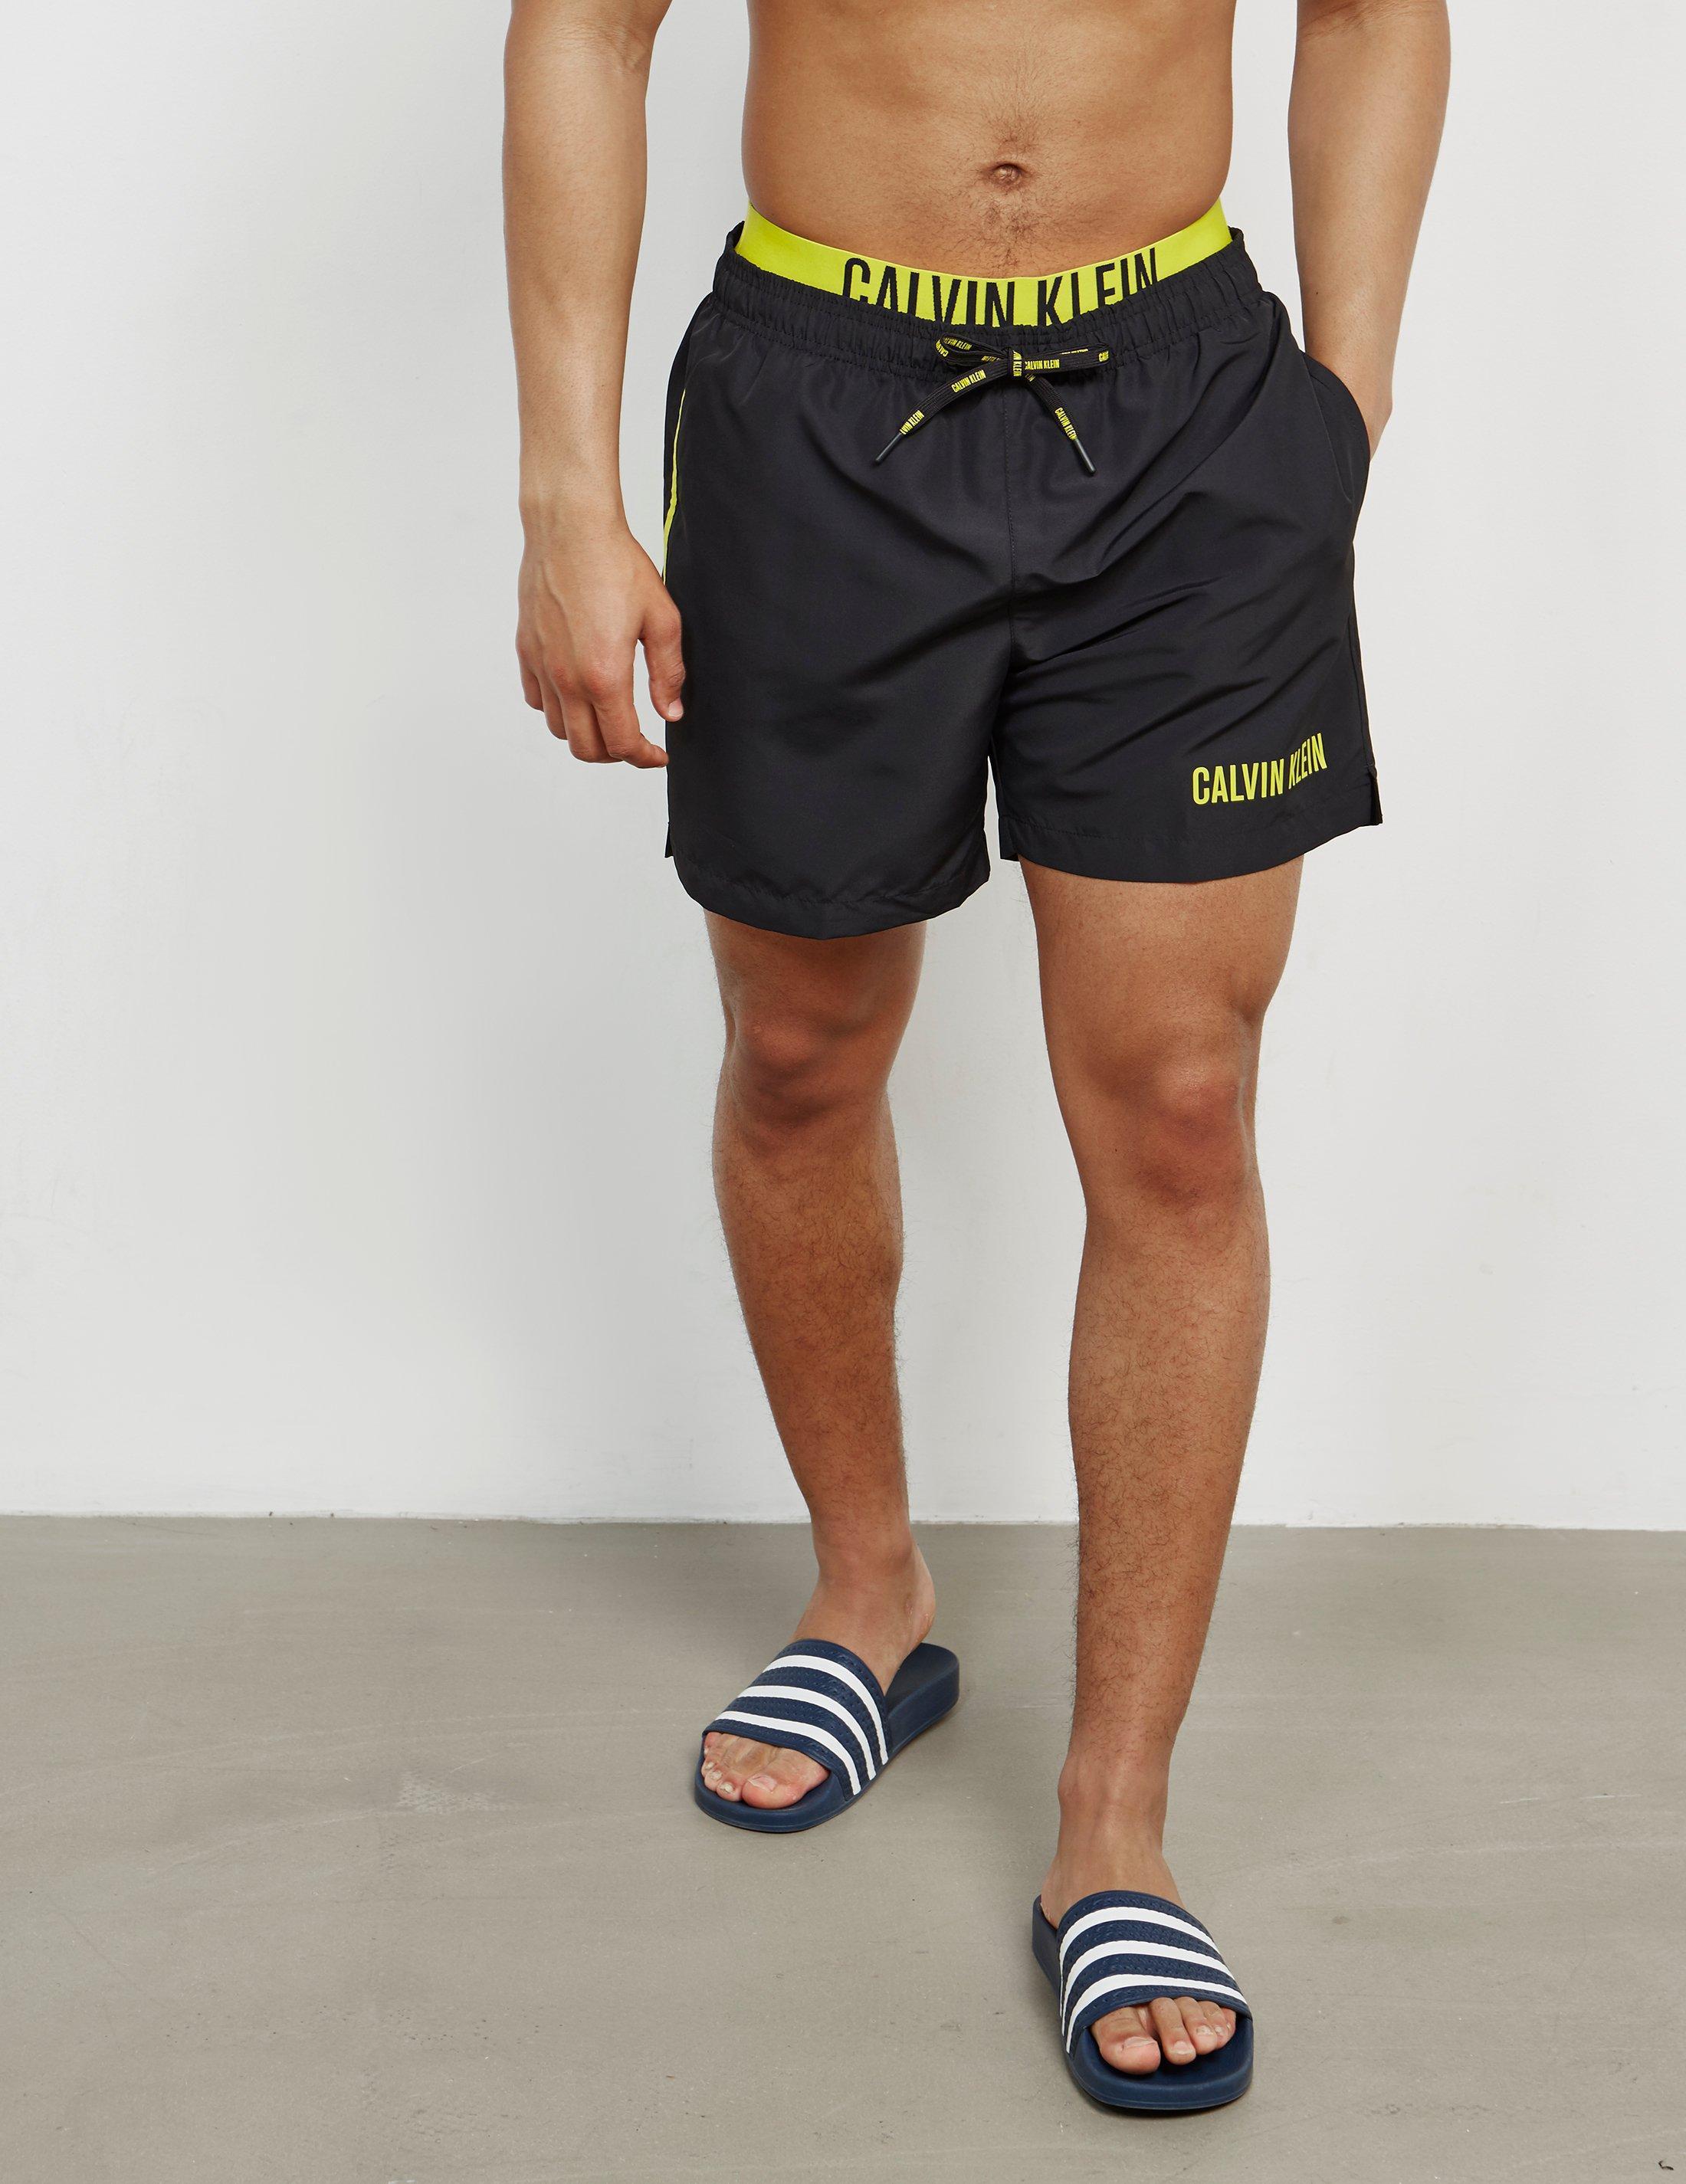 8e65c6c013 Calvin Klein Mens Double Waistband Swim Shorts Black in Black for ...